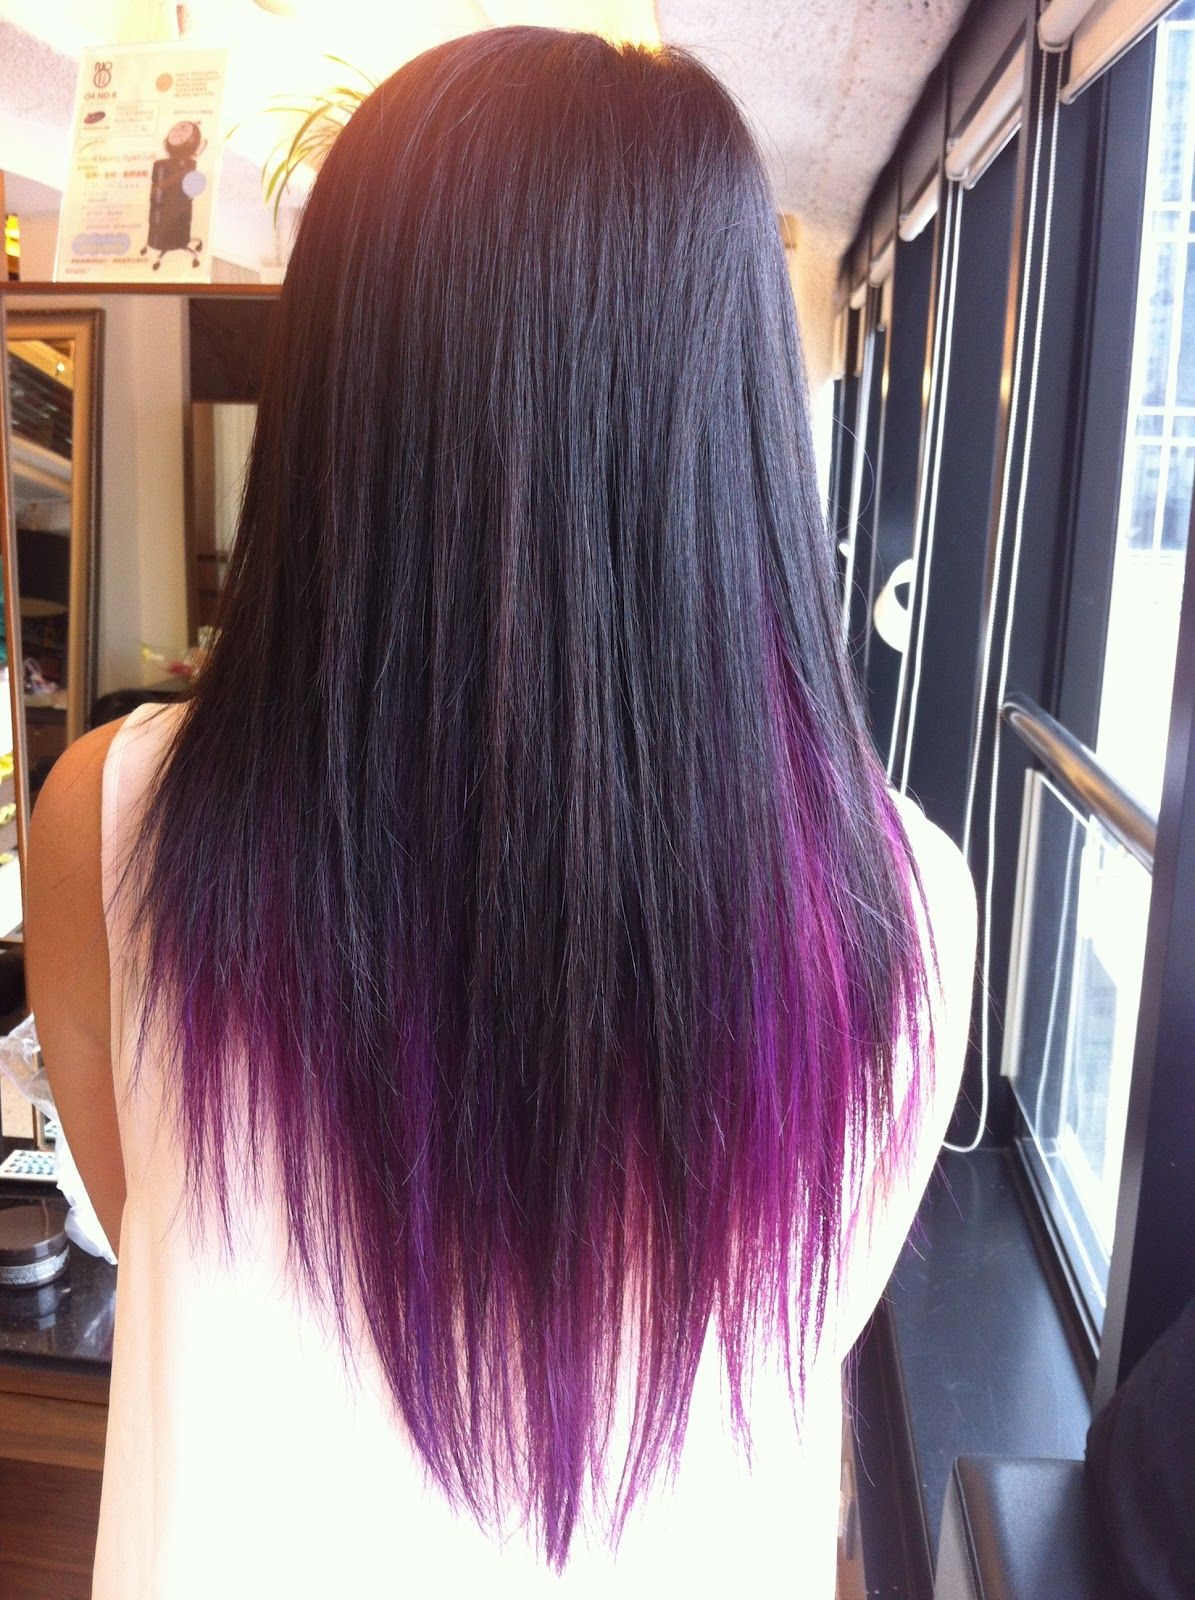 Img 7416 Jpg 1195 1600 Purple Underneath Hair Hair Styles Brown Layered Hair